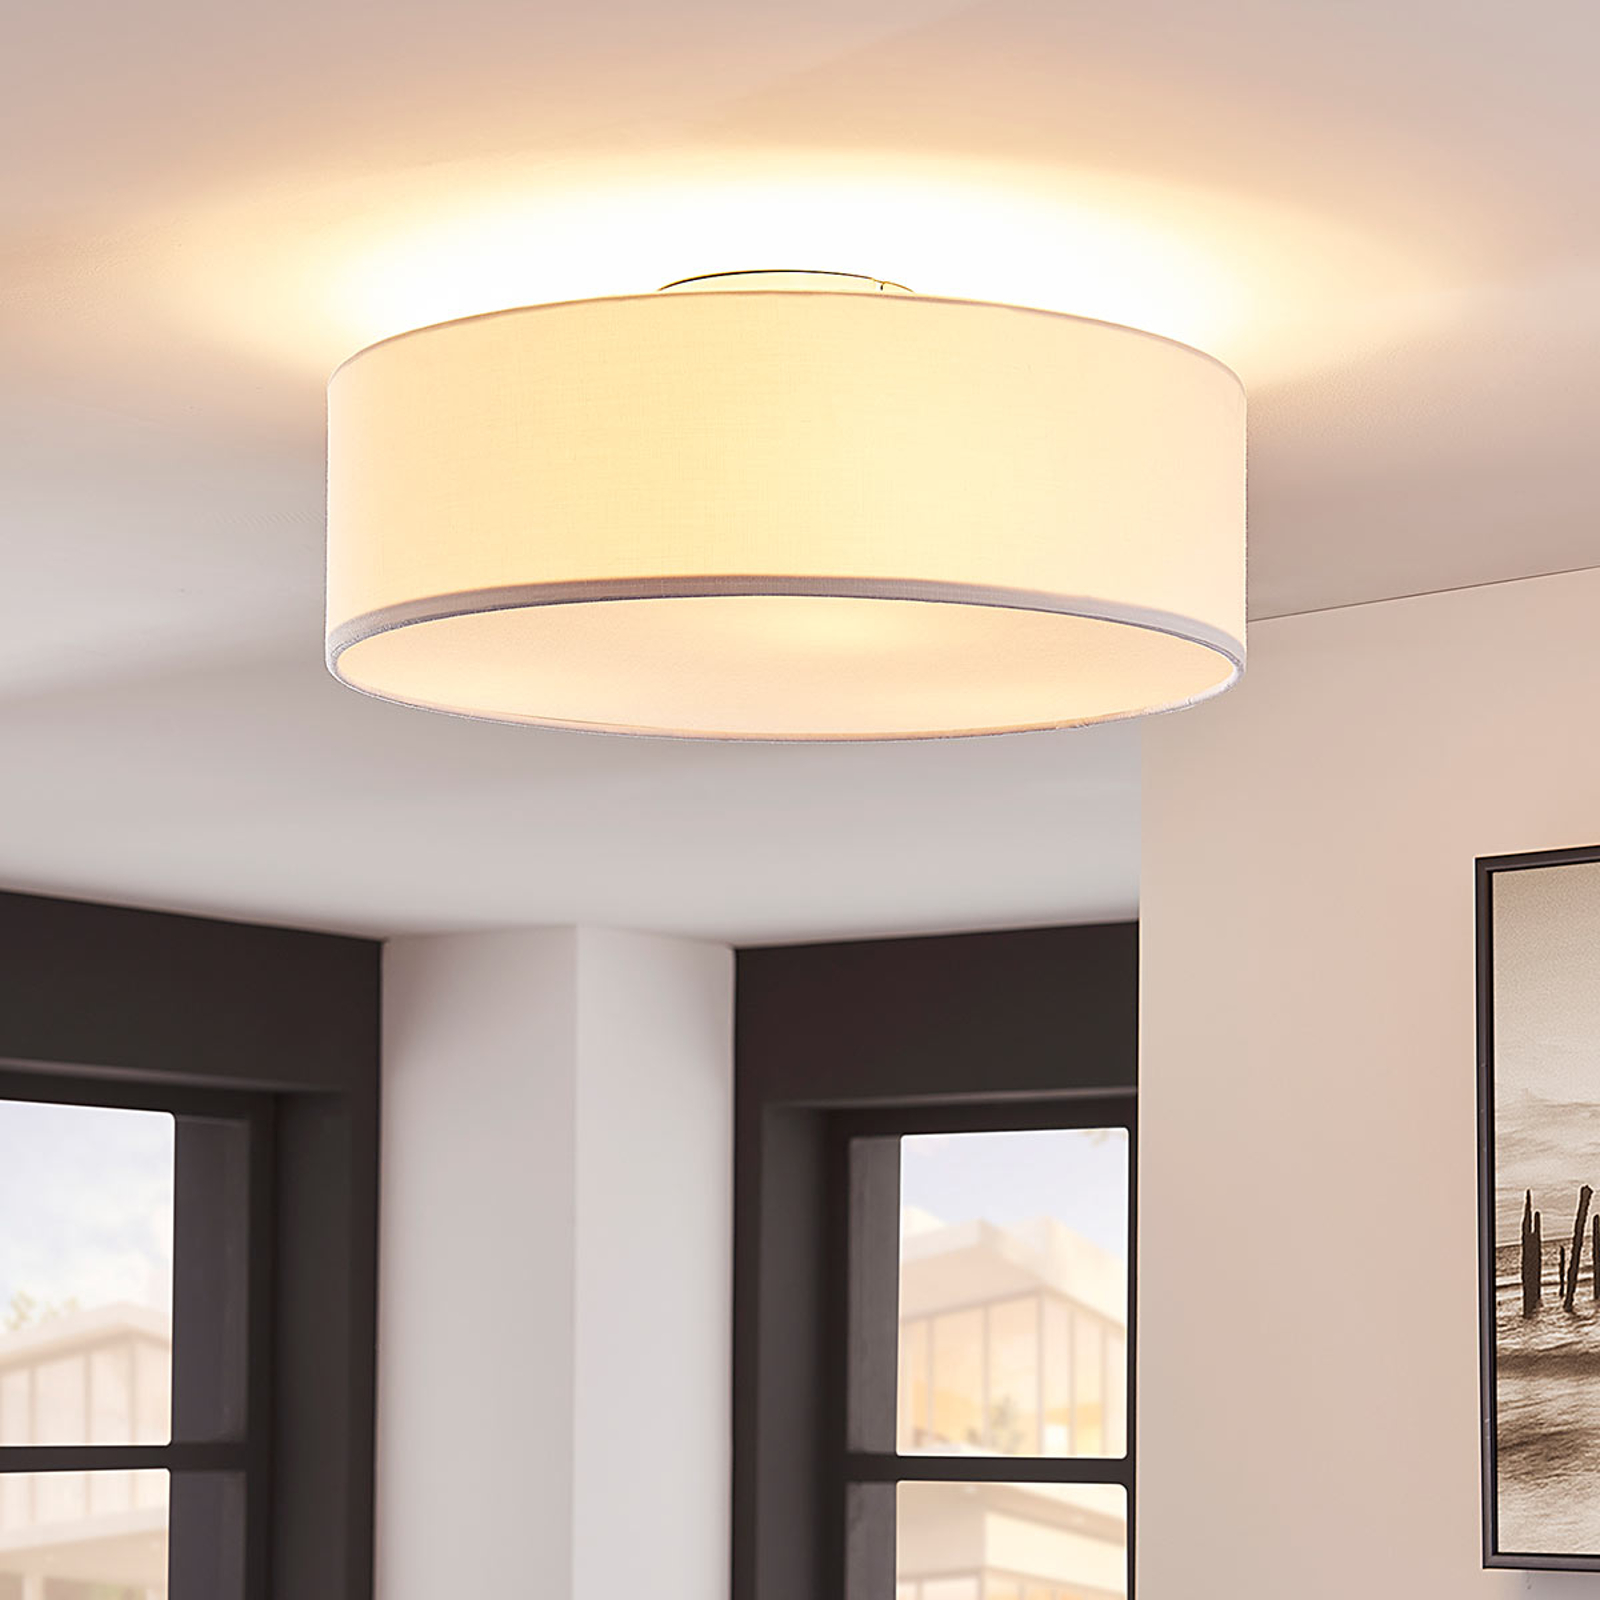 SEBATIN - biała lampa sufitowa z materiału